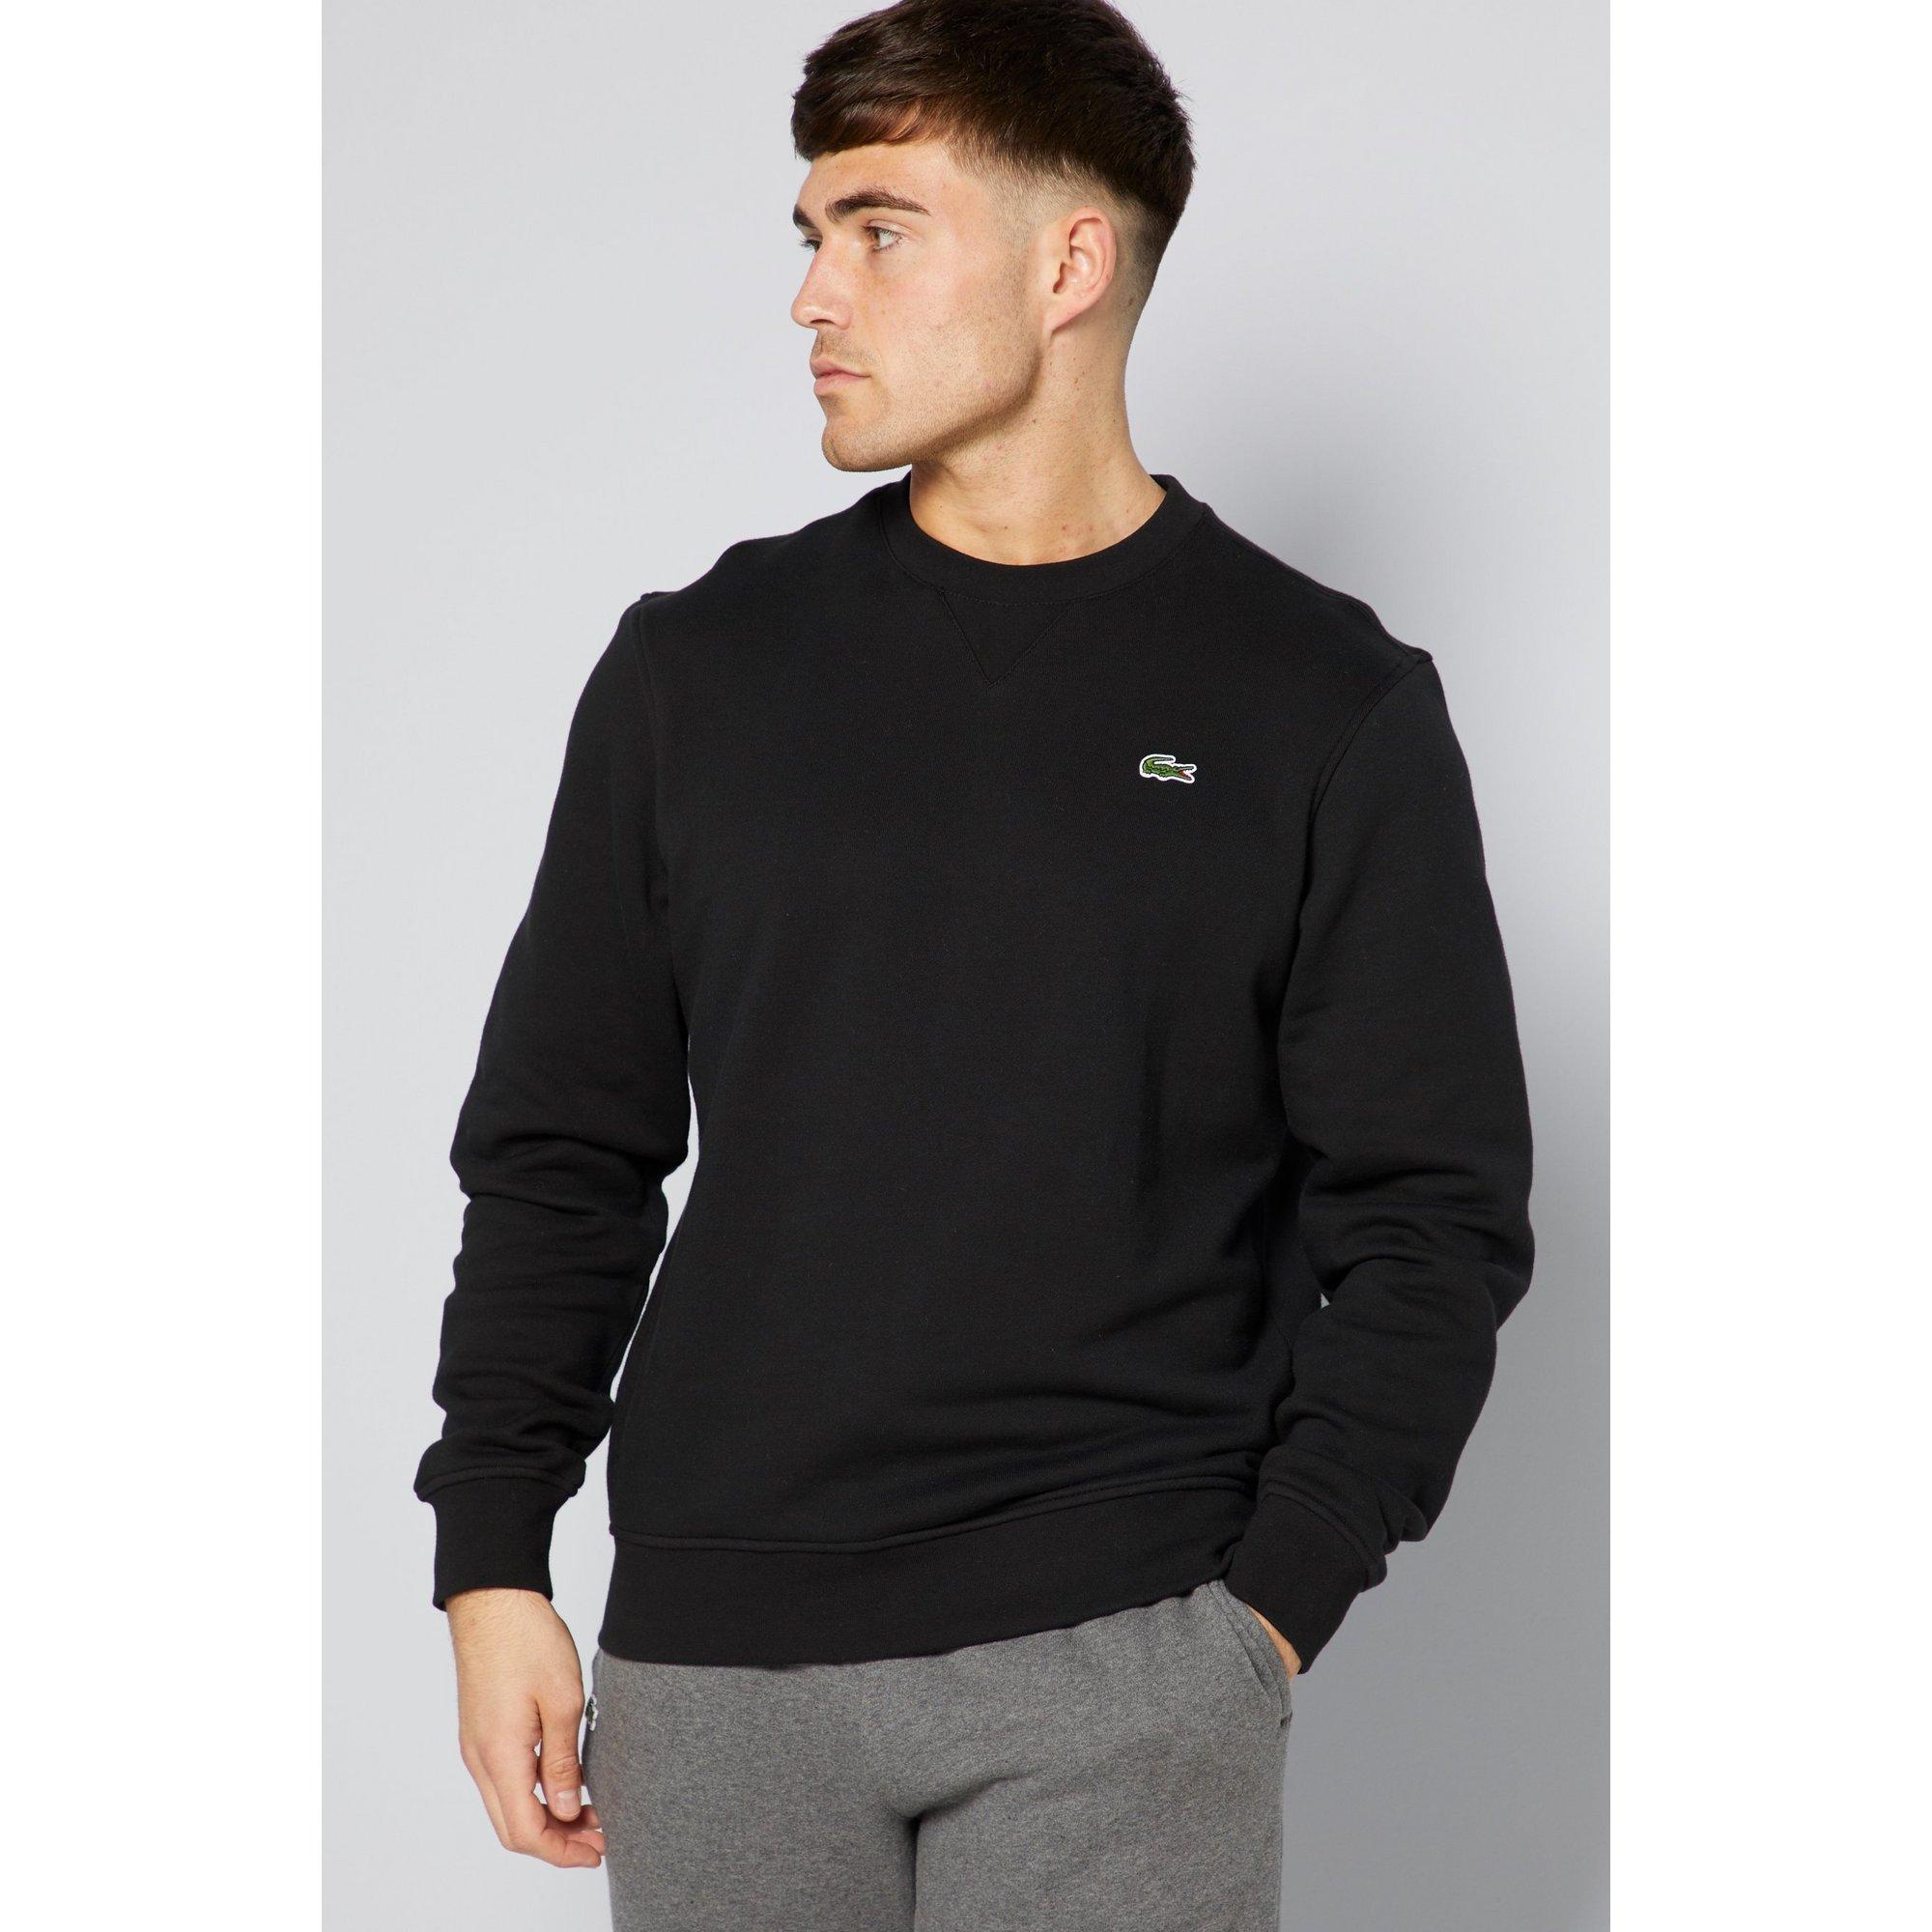 Image of Lacoste Basic Crew Black Sweatshirt